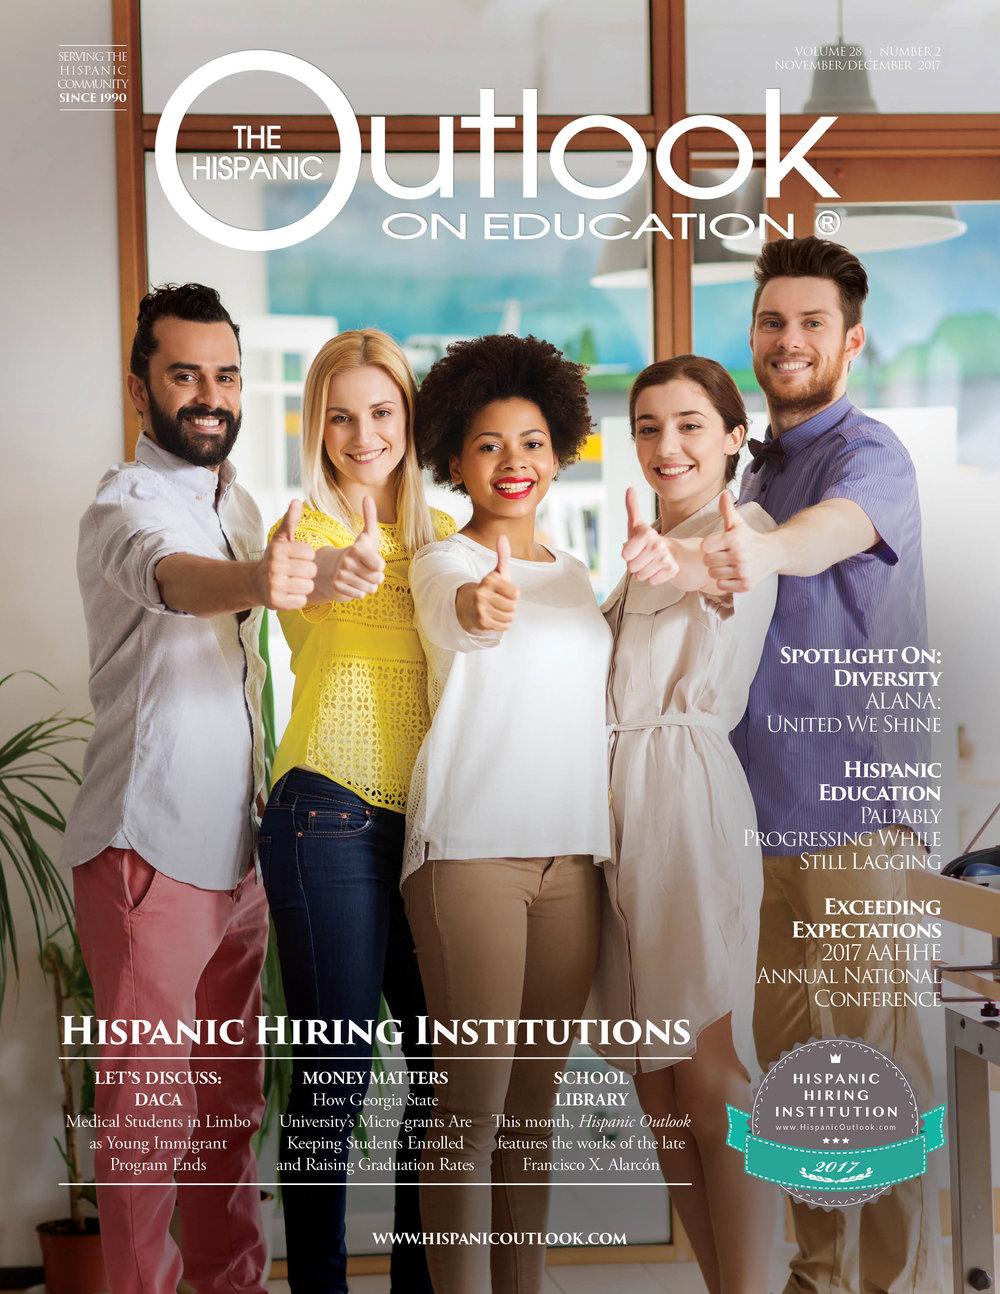 hispanic hiring institutions ISSUE 2017